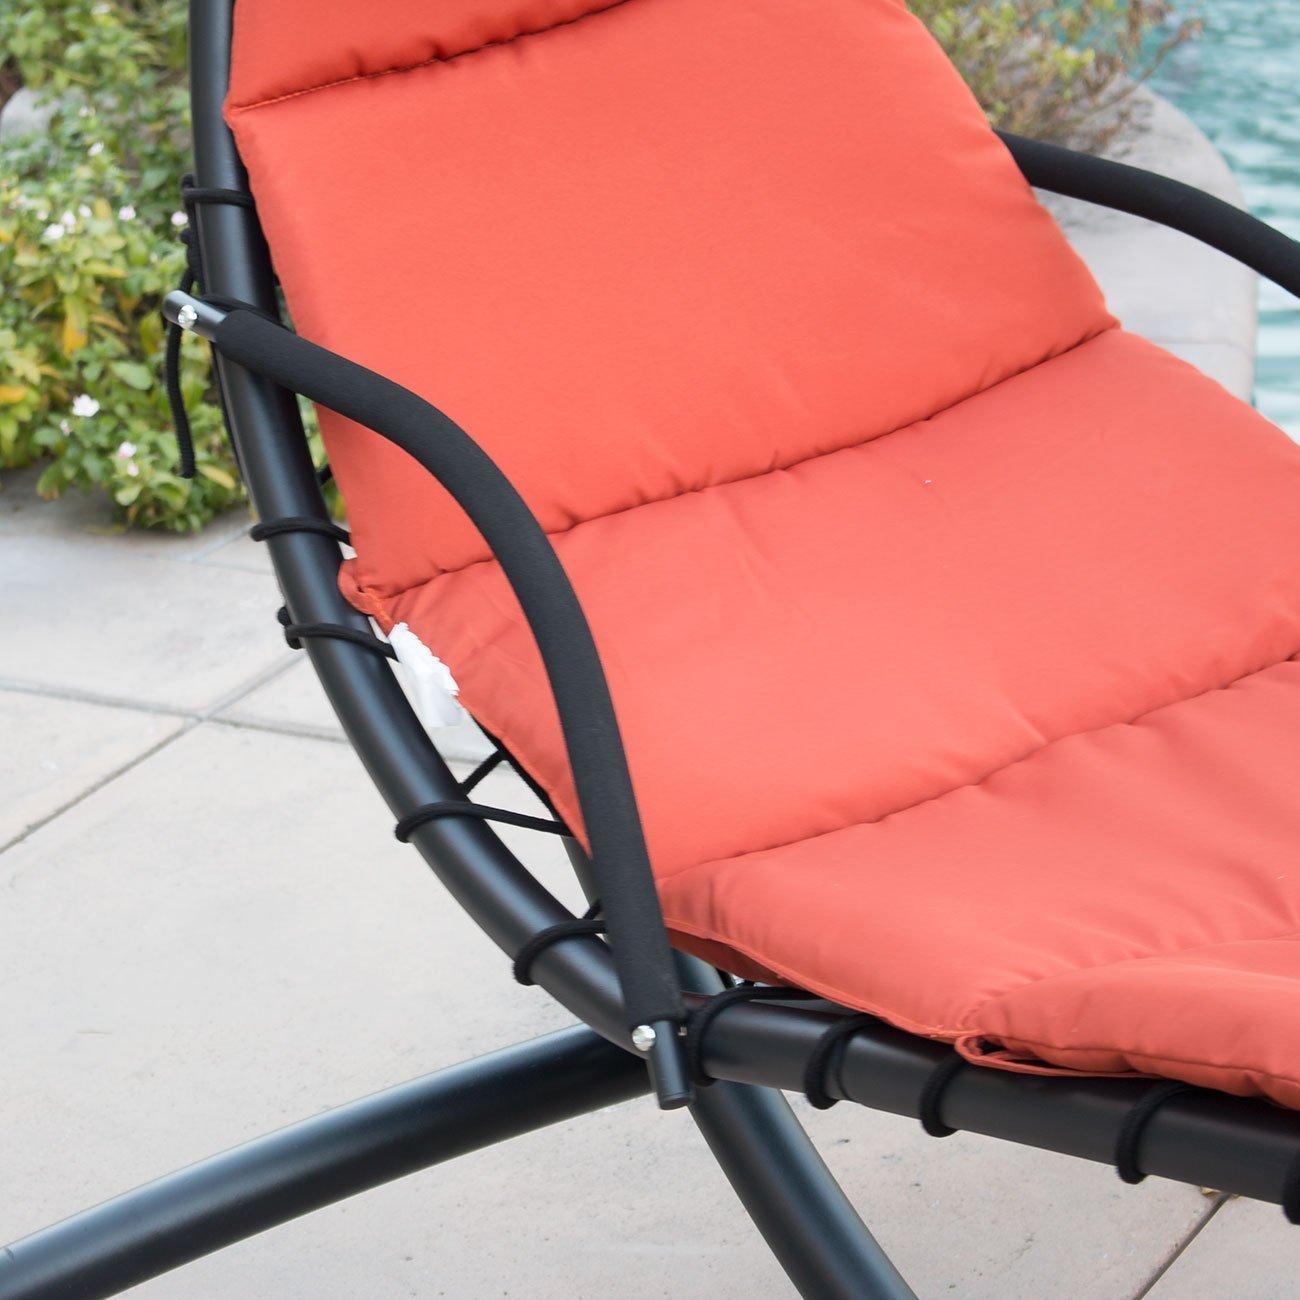 hanging hammock lounge chair nilkamal plastic price in india orange dream lounger heavenly hammocks